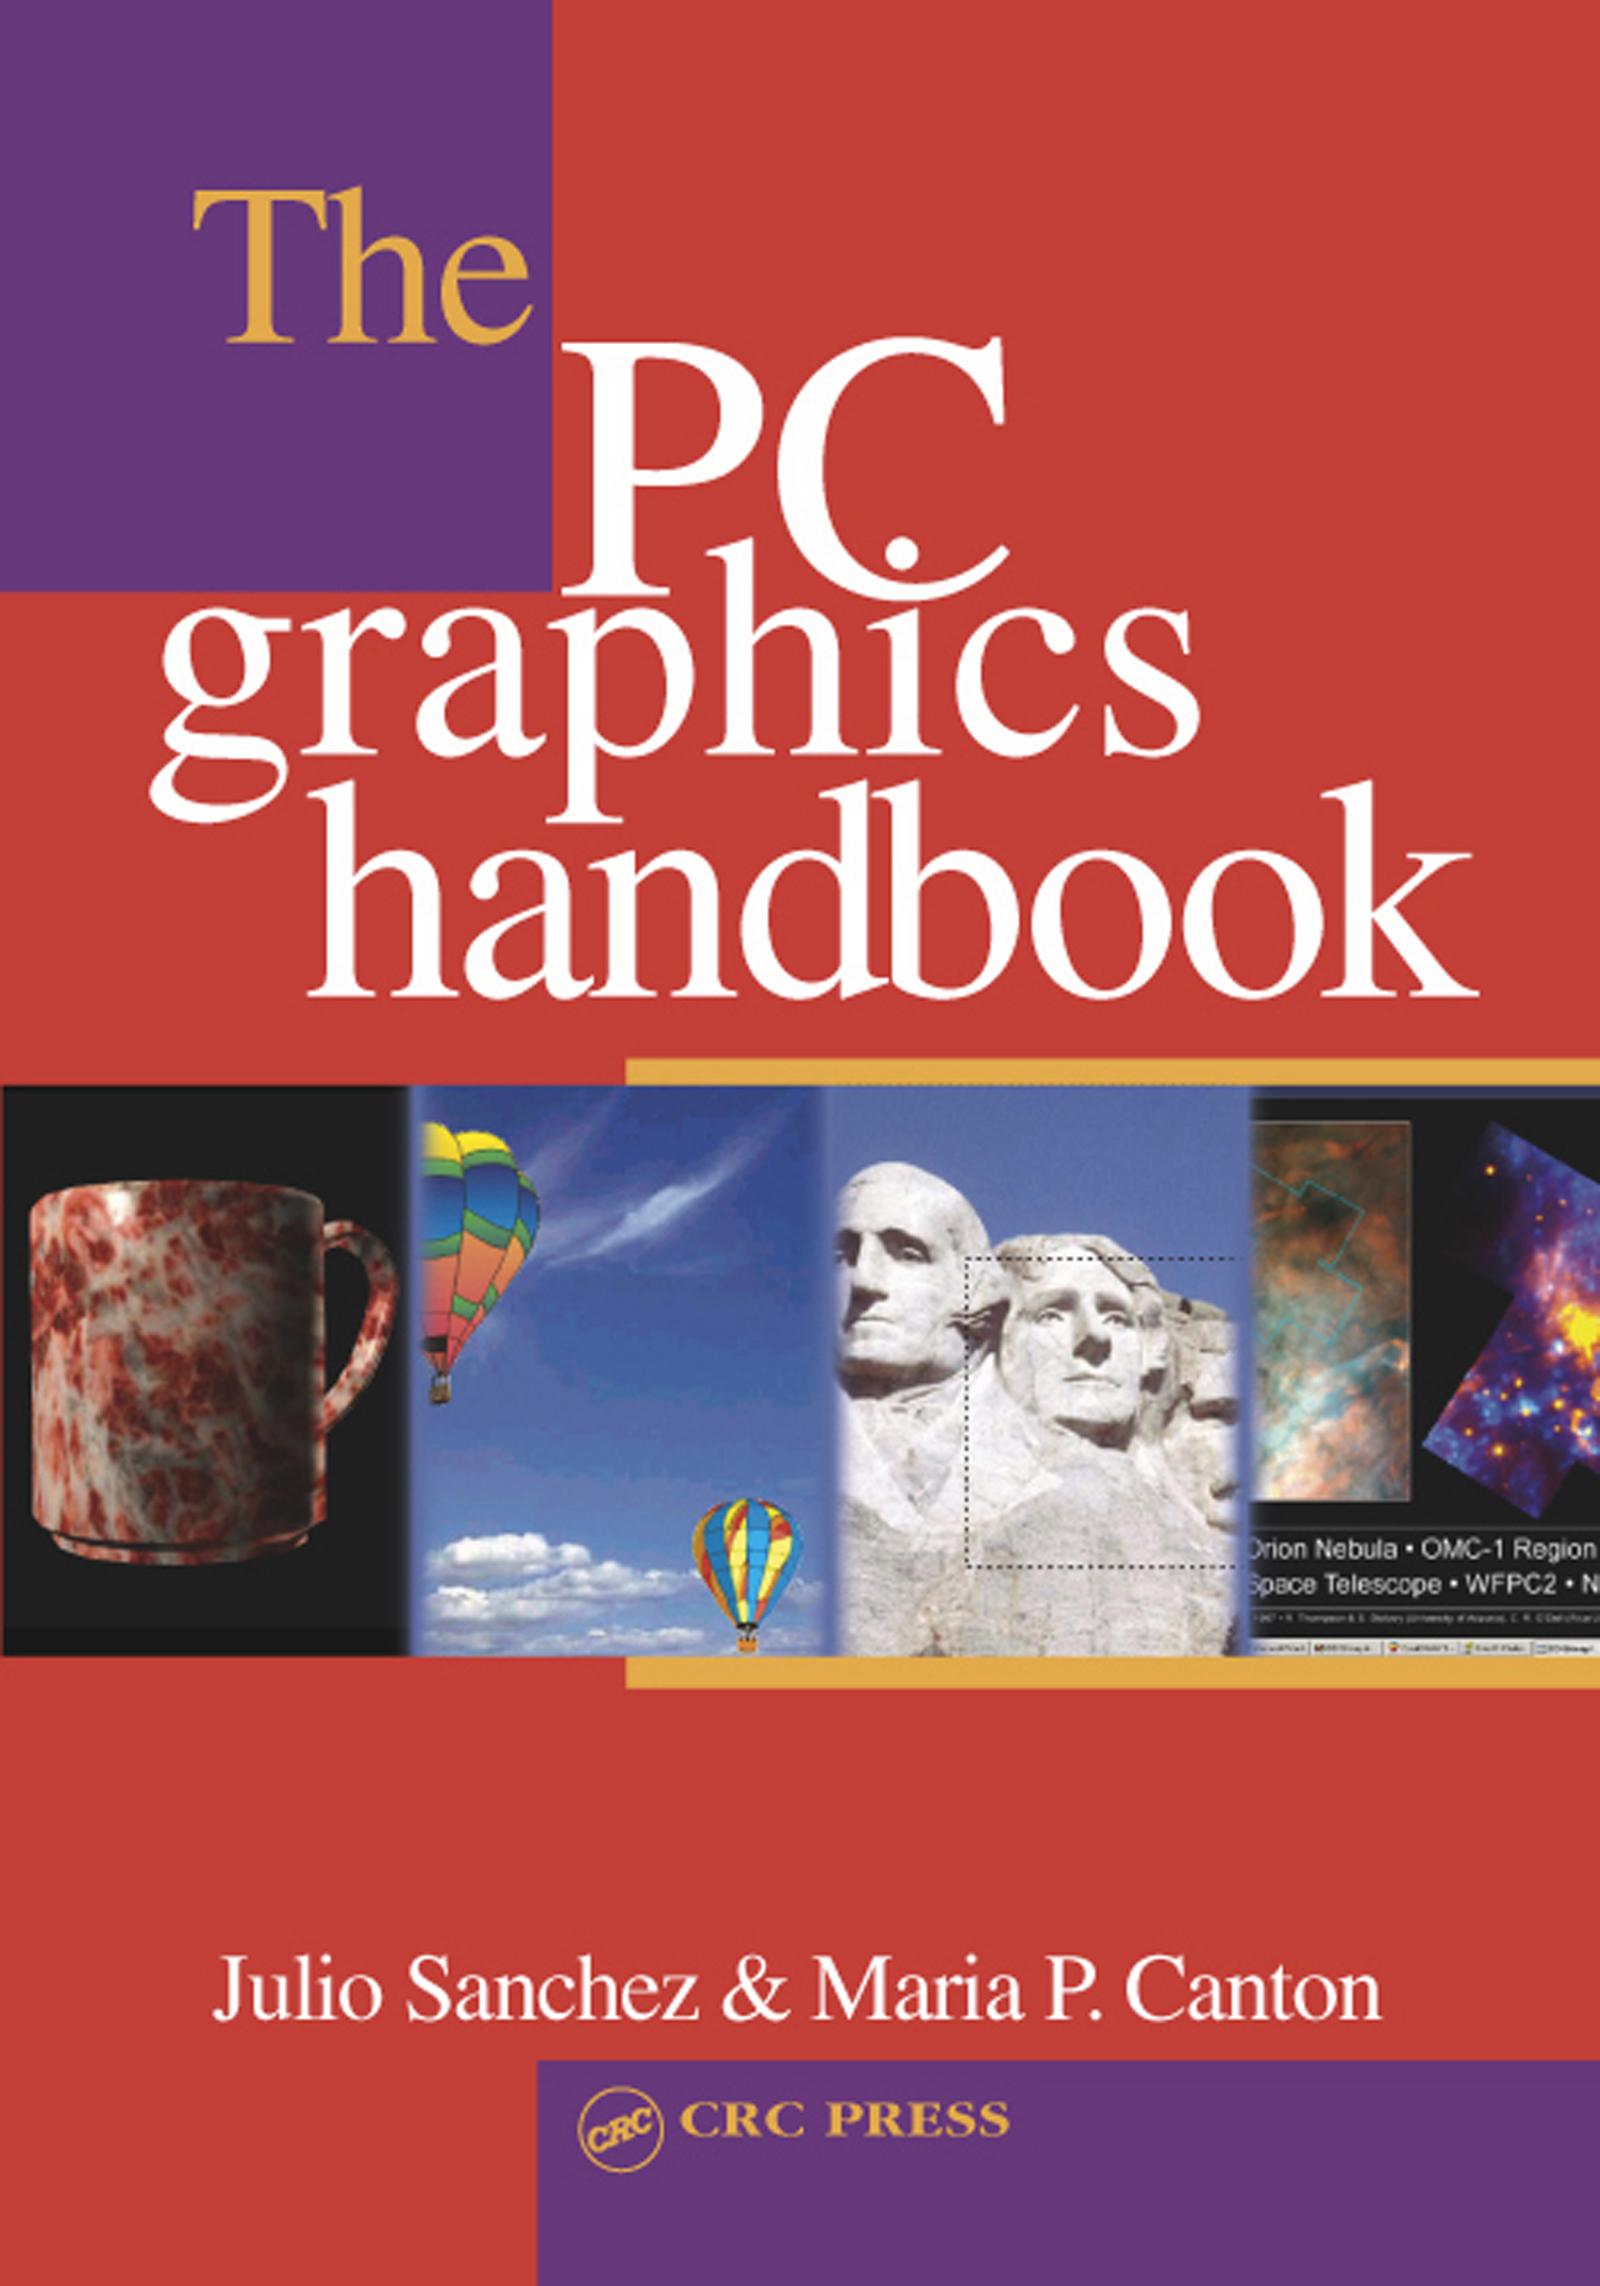 - Windows Bitmapped Graphics